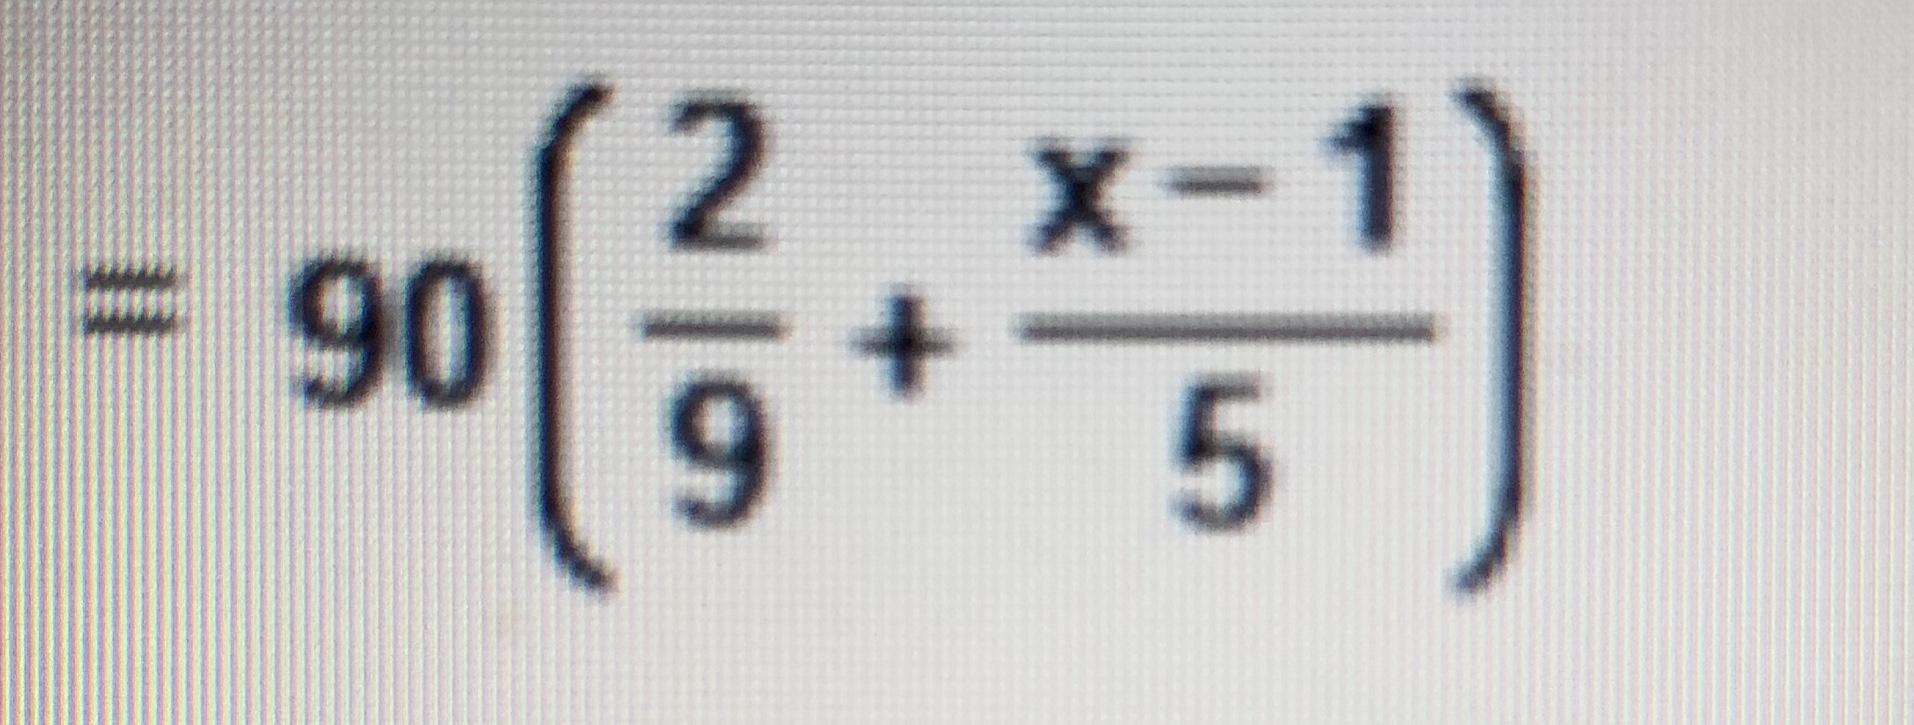 2 X- + 9 90